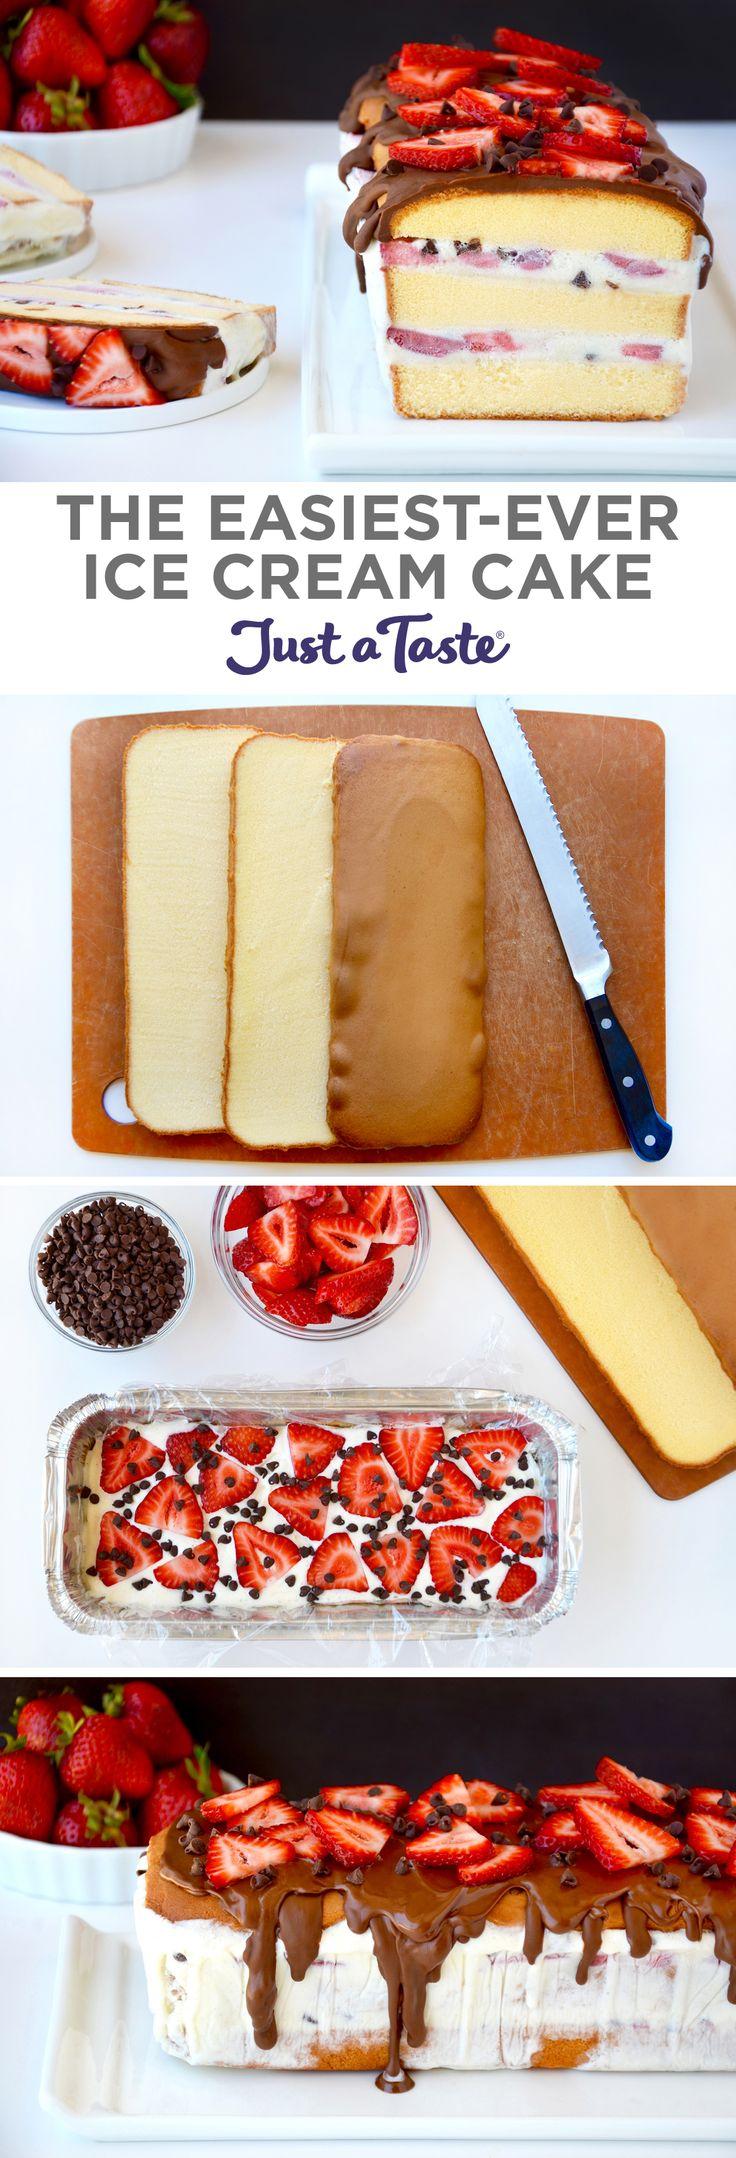 The Easiest-Ever Ice Cream Cake | recipe via justataste.com